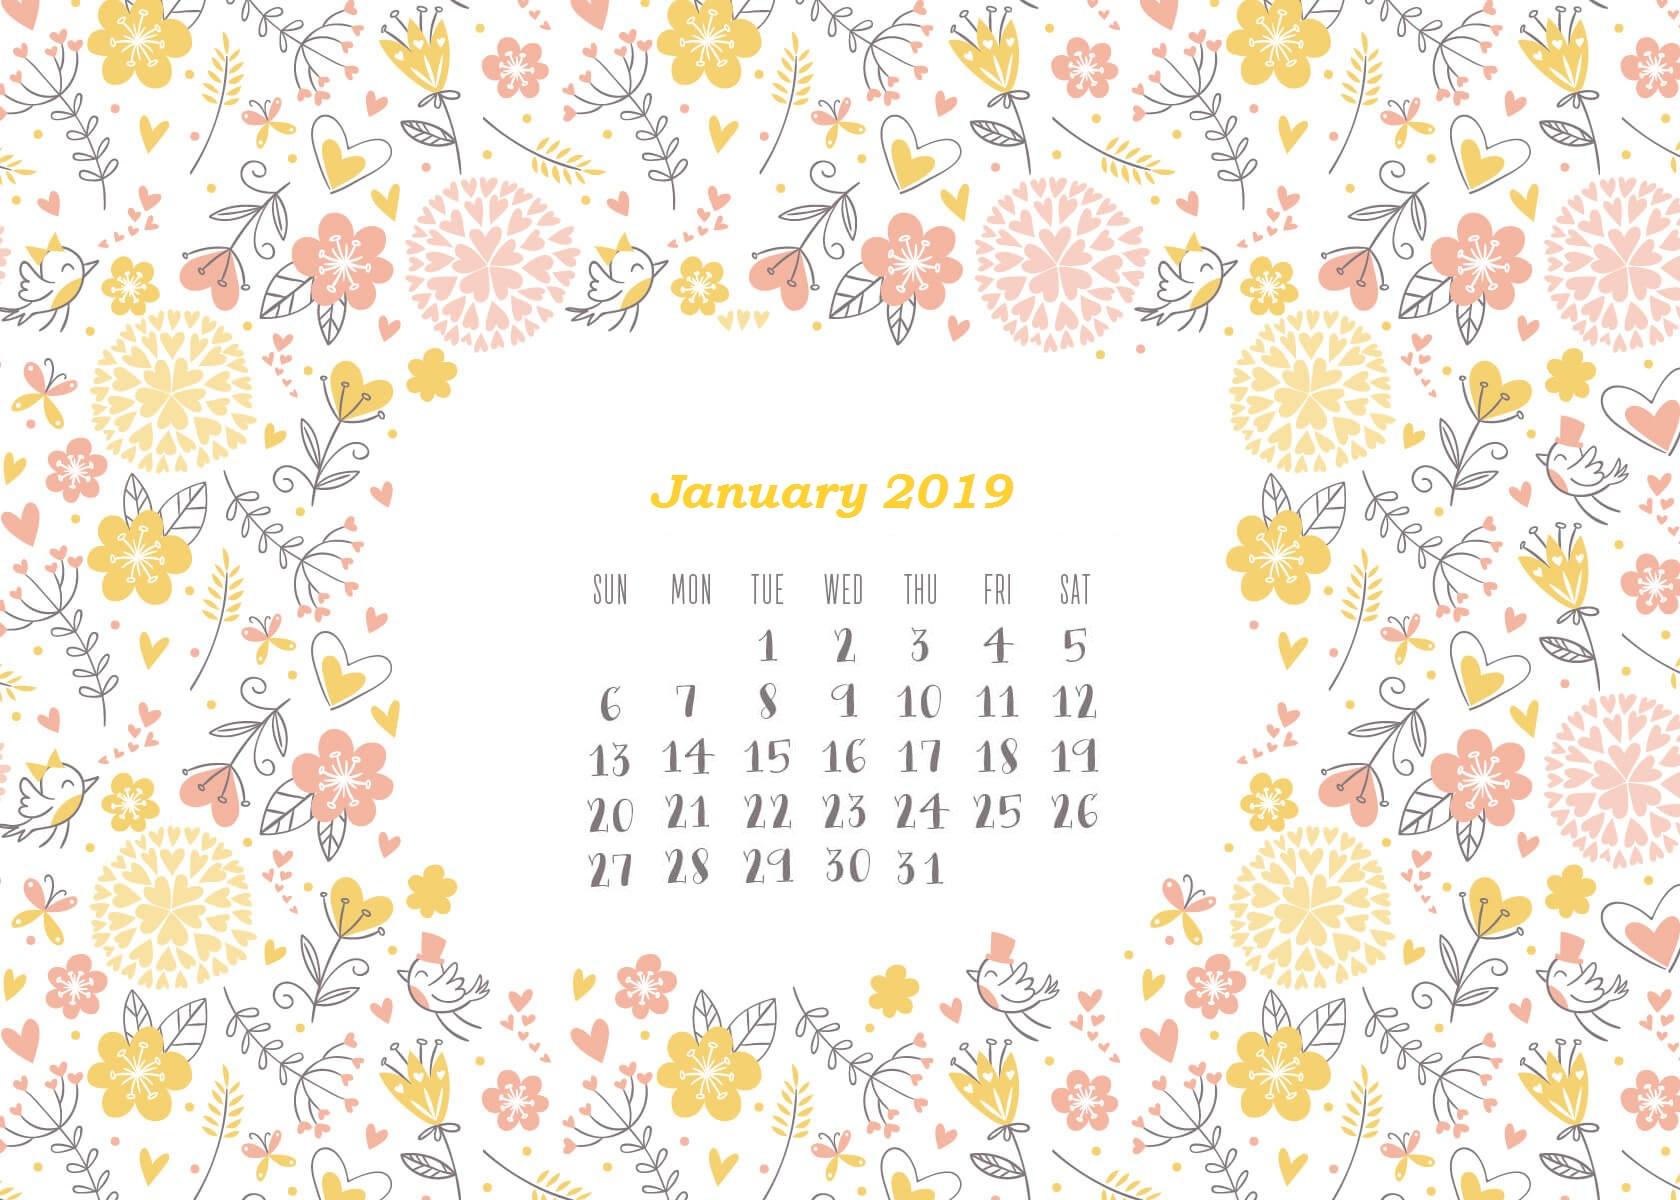 January 2019 HD Calendar Wallpapers Calendar 2019 1680x1200